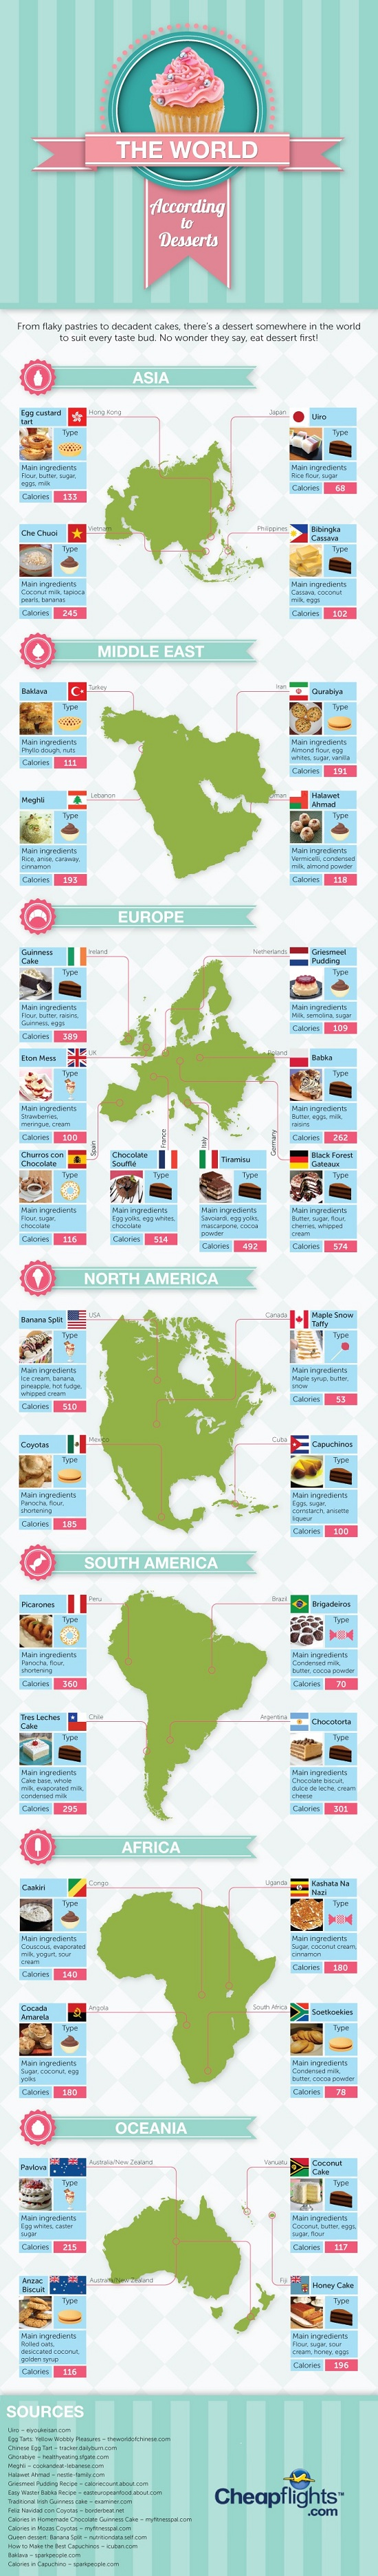 the-world-according-to-desserts-infographic_52668eb493ca3